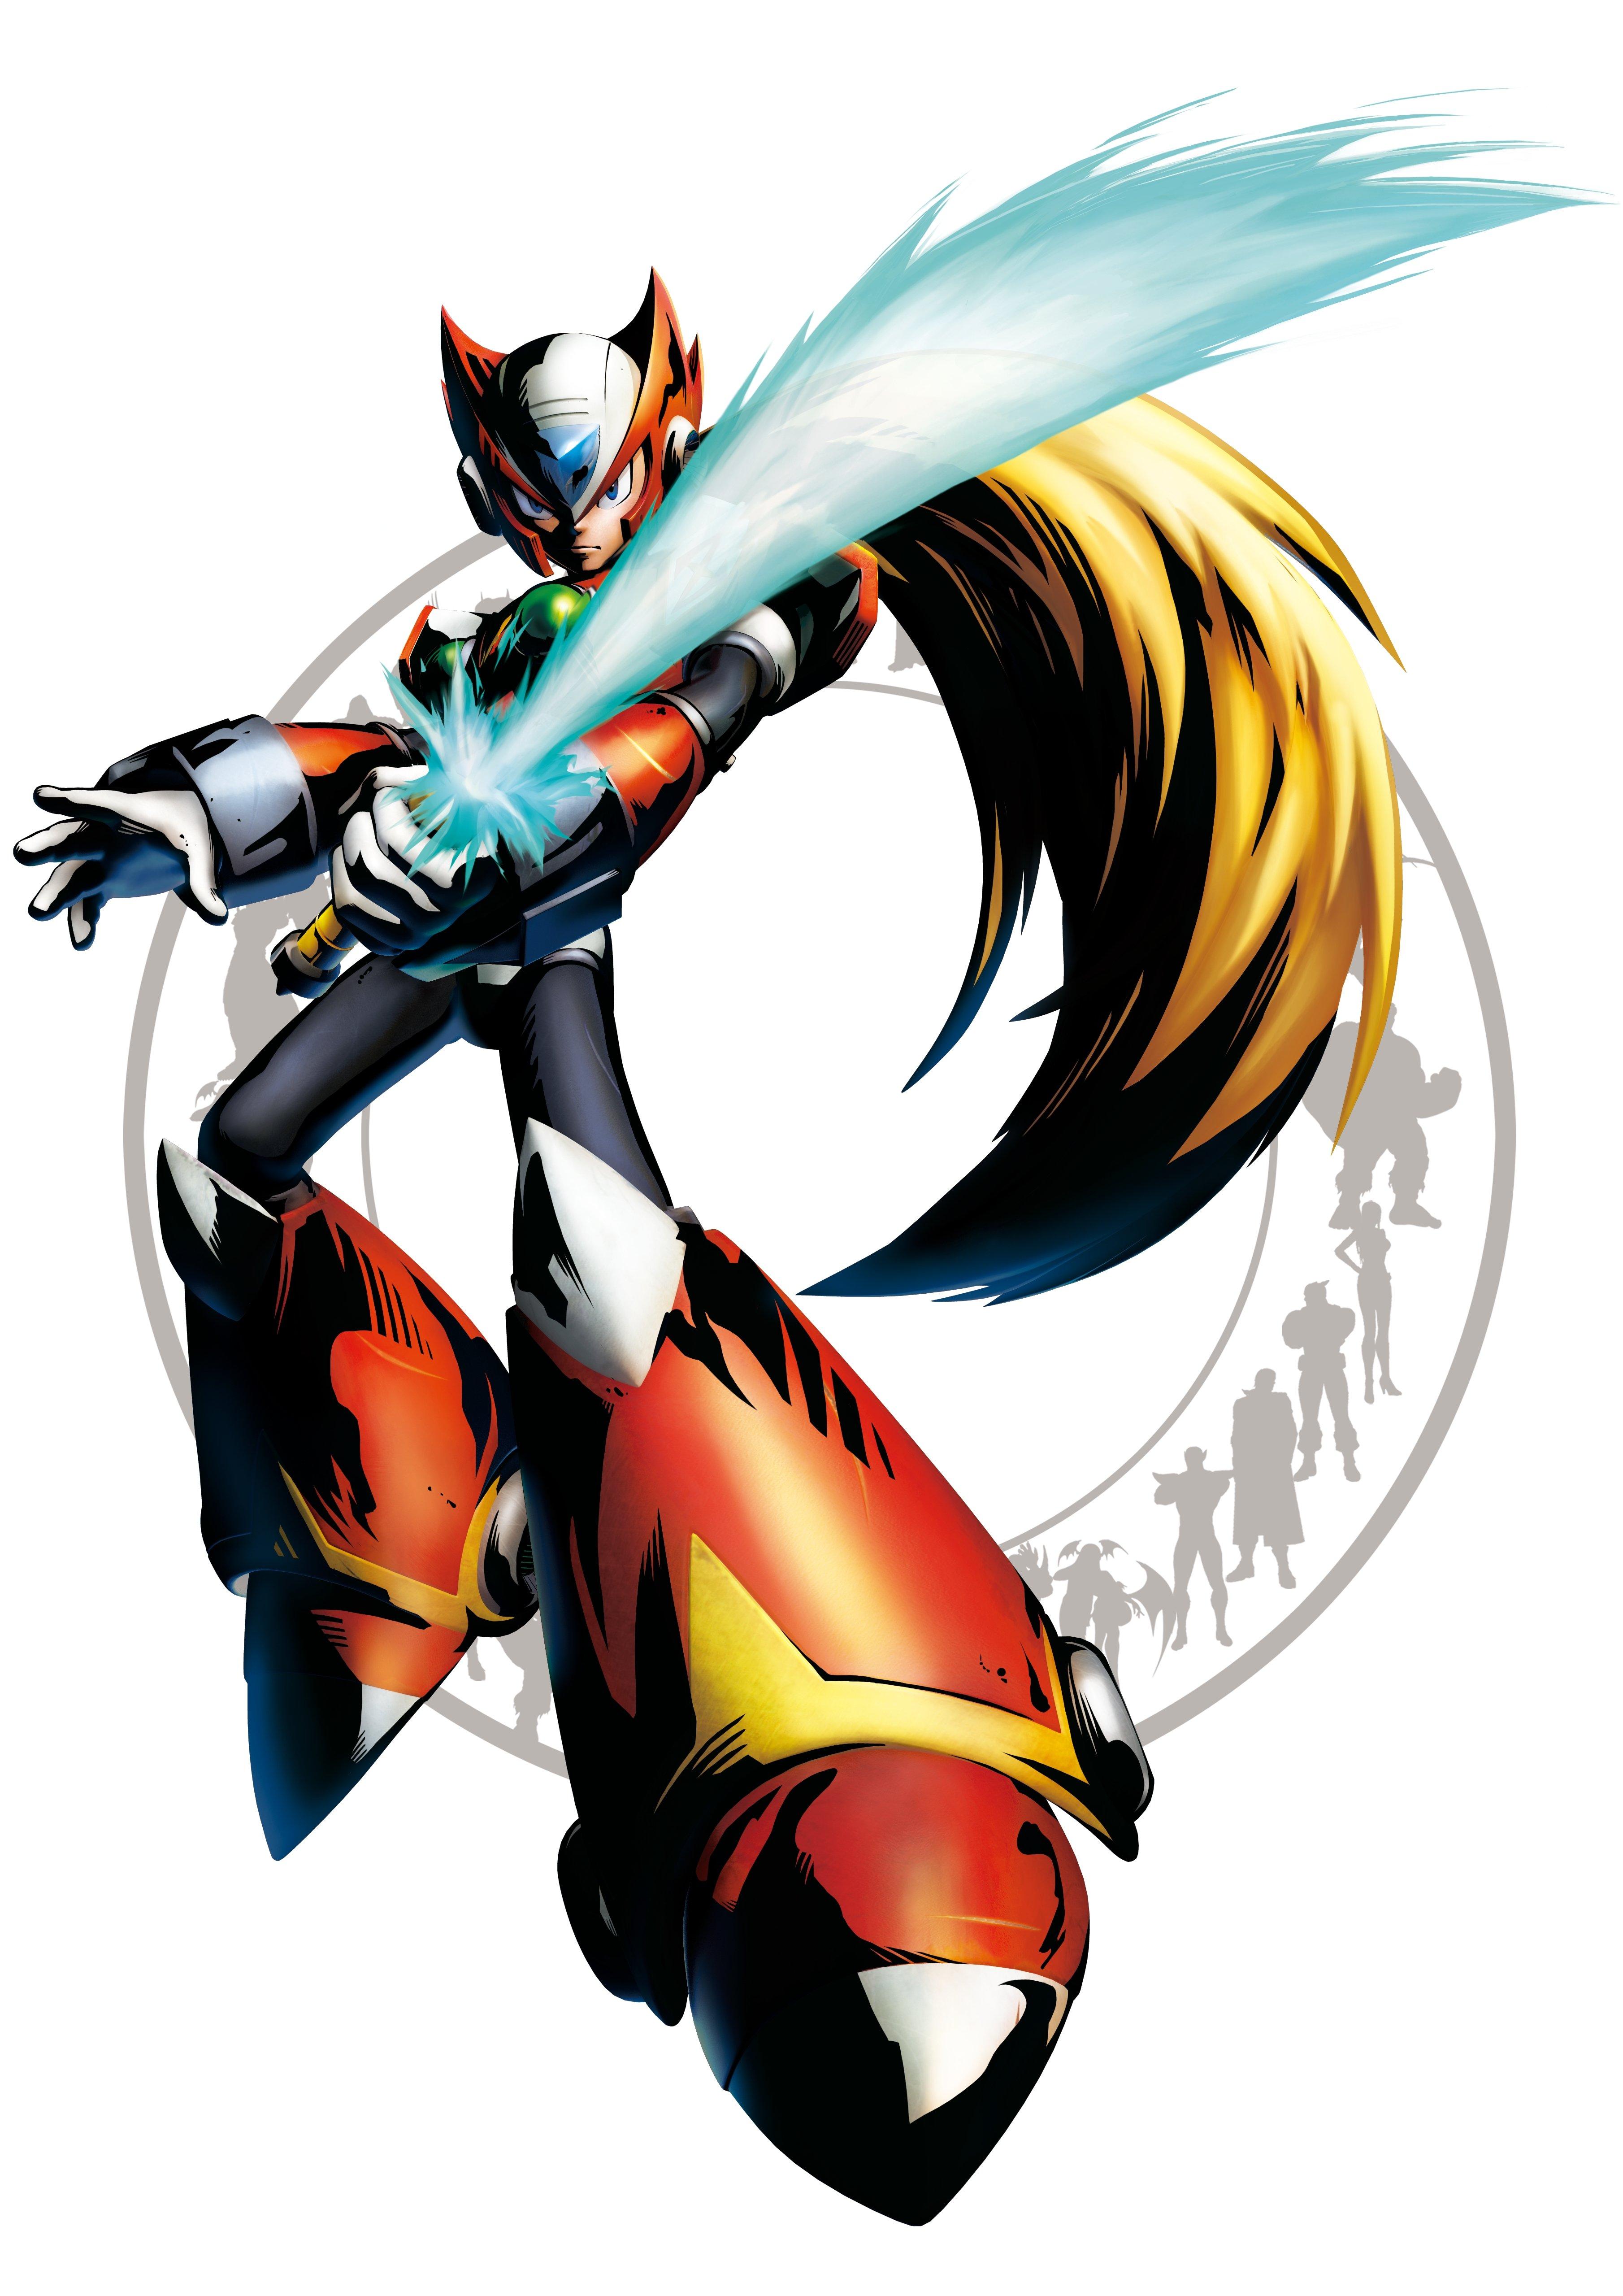 Зеро - Marvel vs. Capcom 3: Fate of Two Worlds Арт, Персонаж